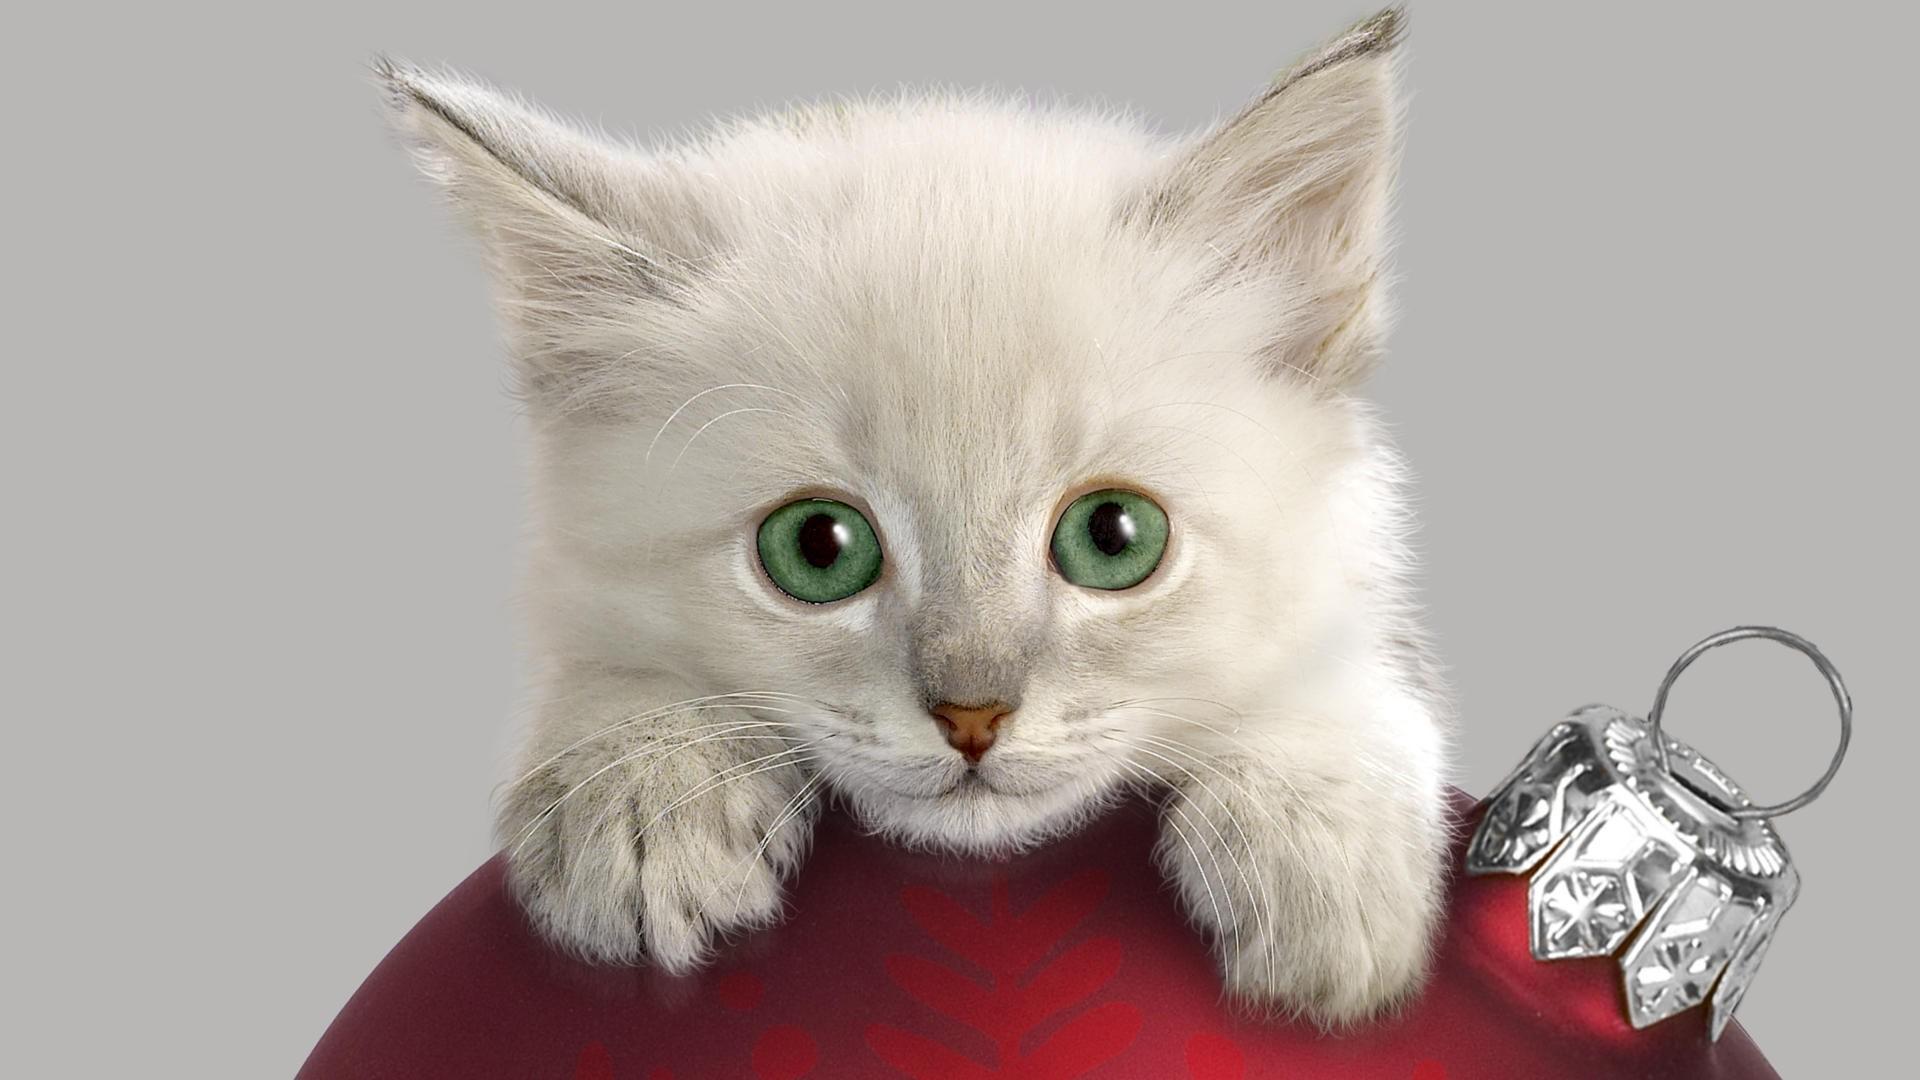 Hermoso gato blanco - 1920x1080